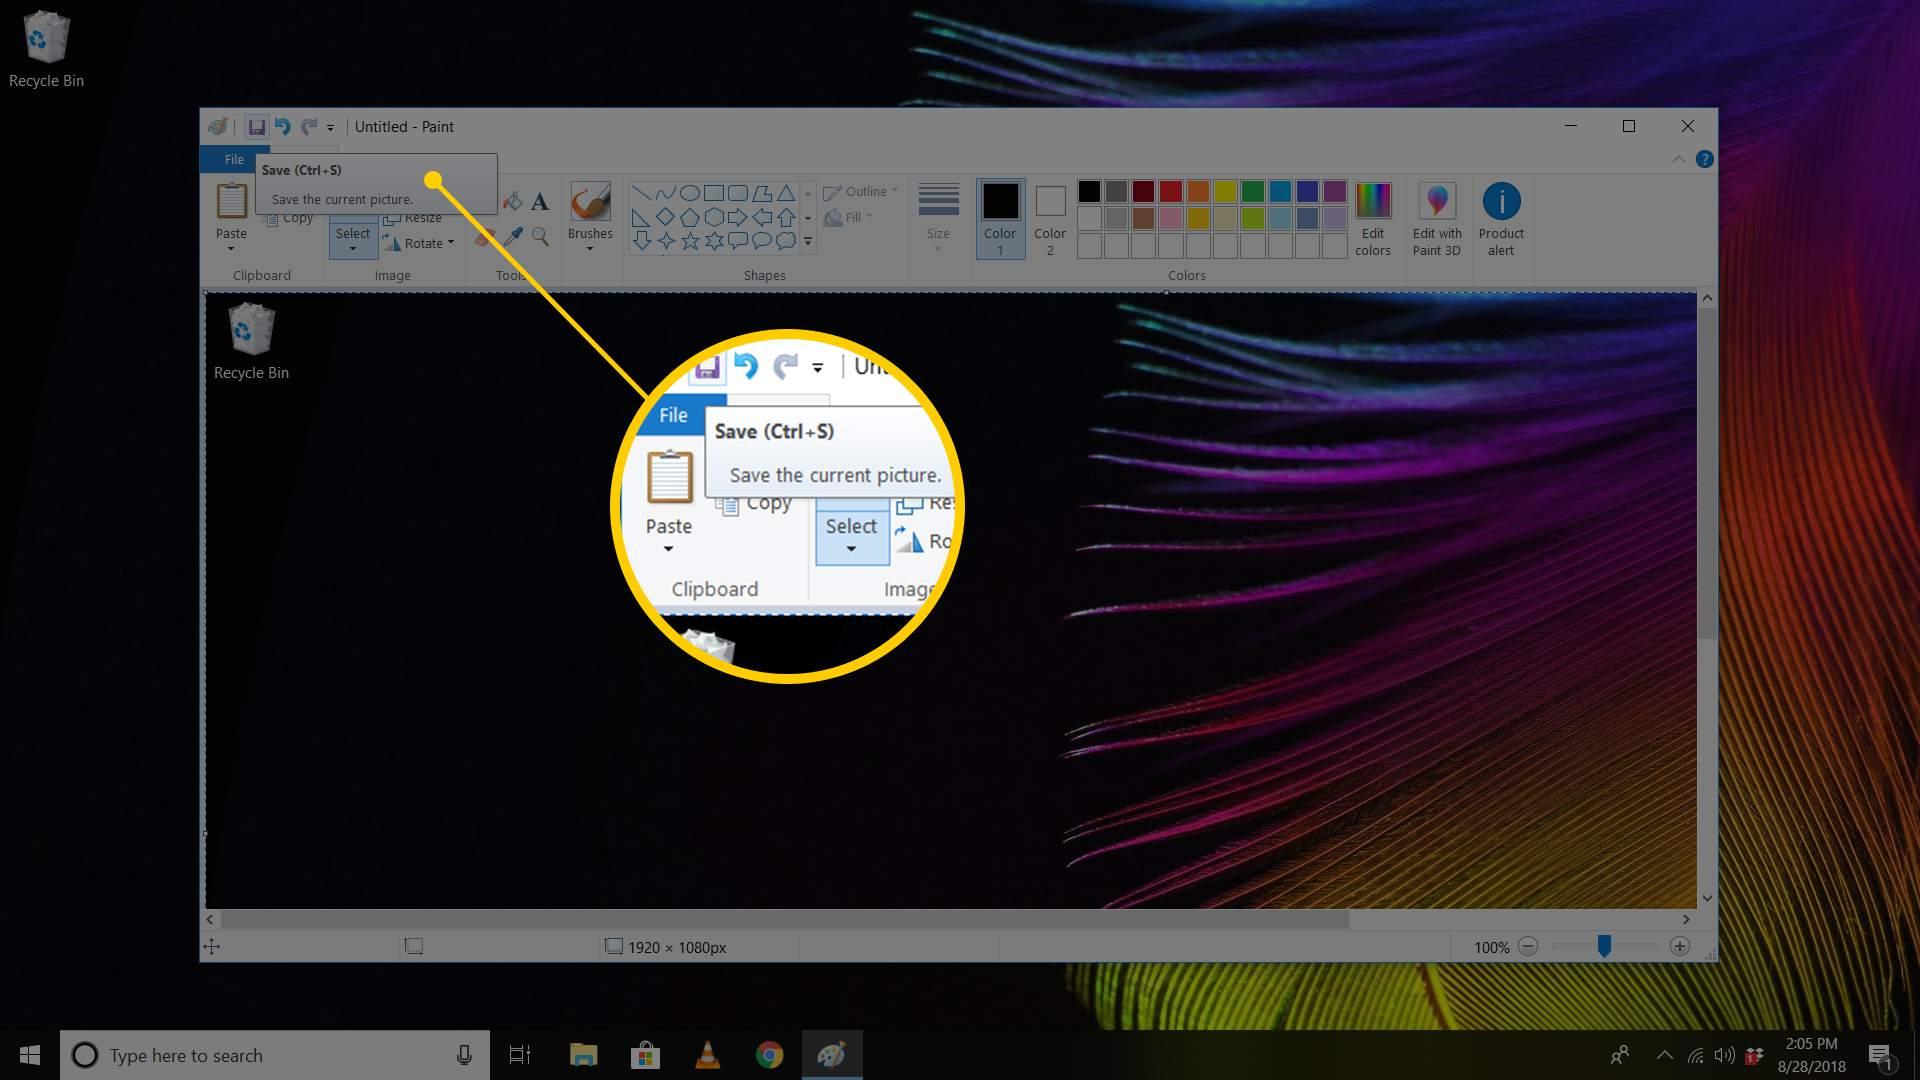 Screenshot of MSPaint window focusing on Save/Ctrl-S